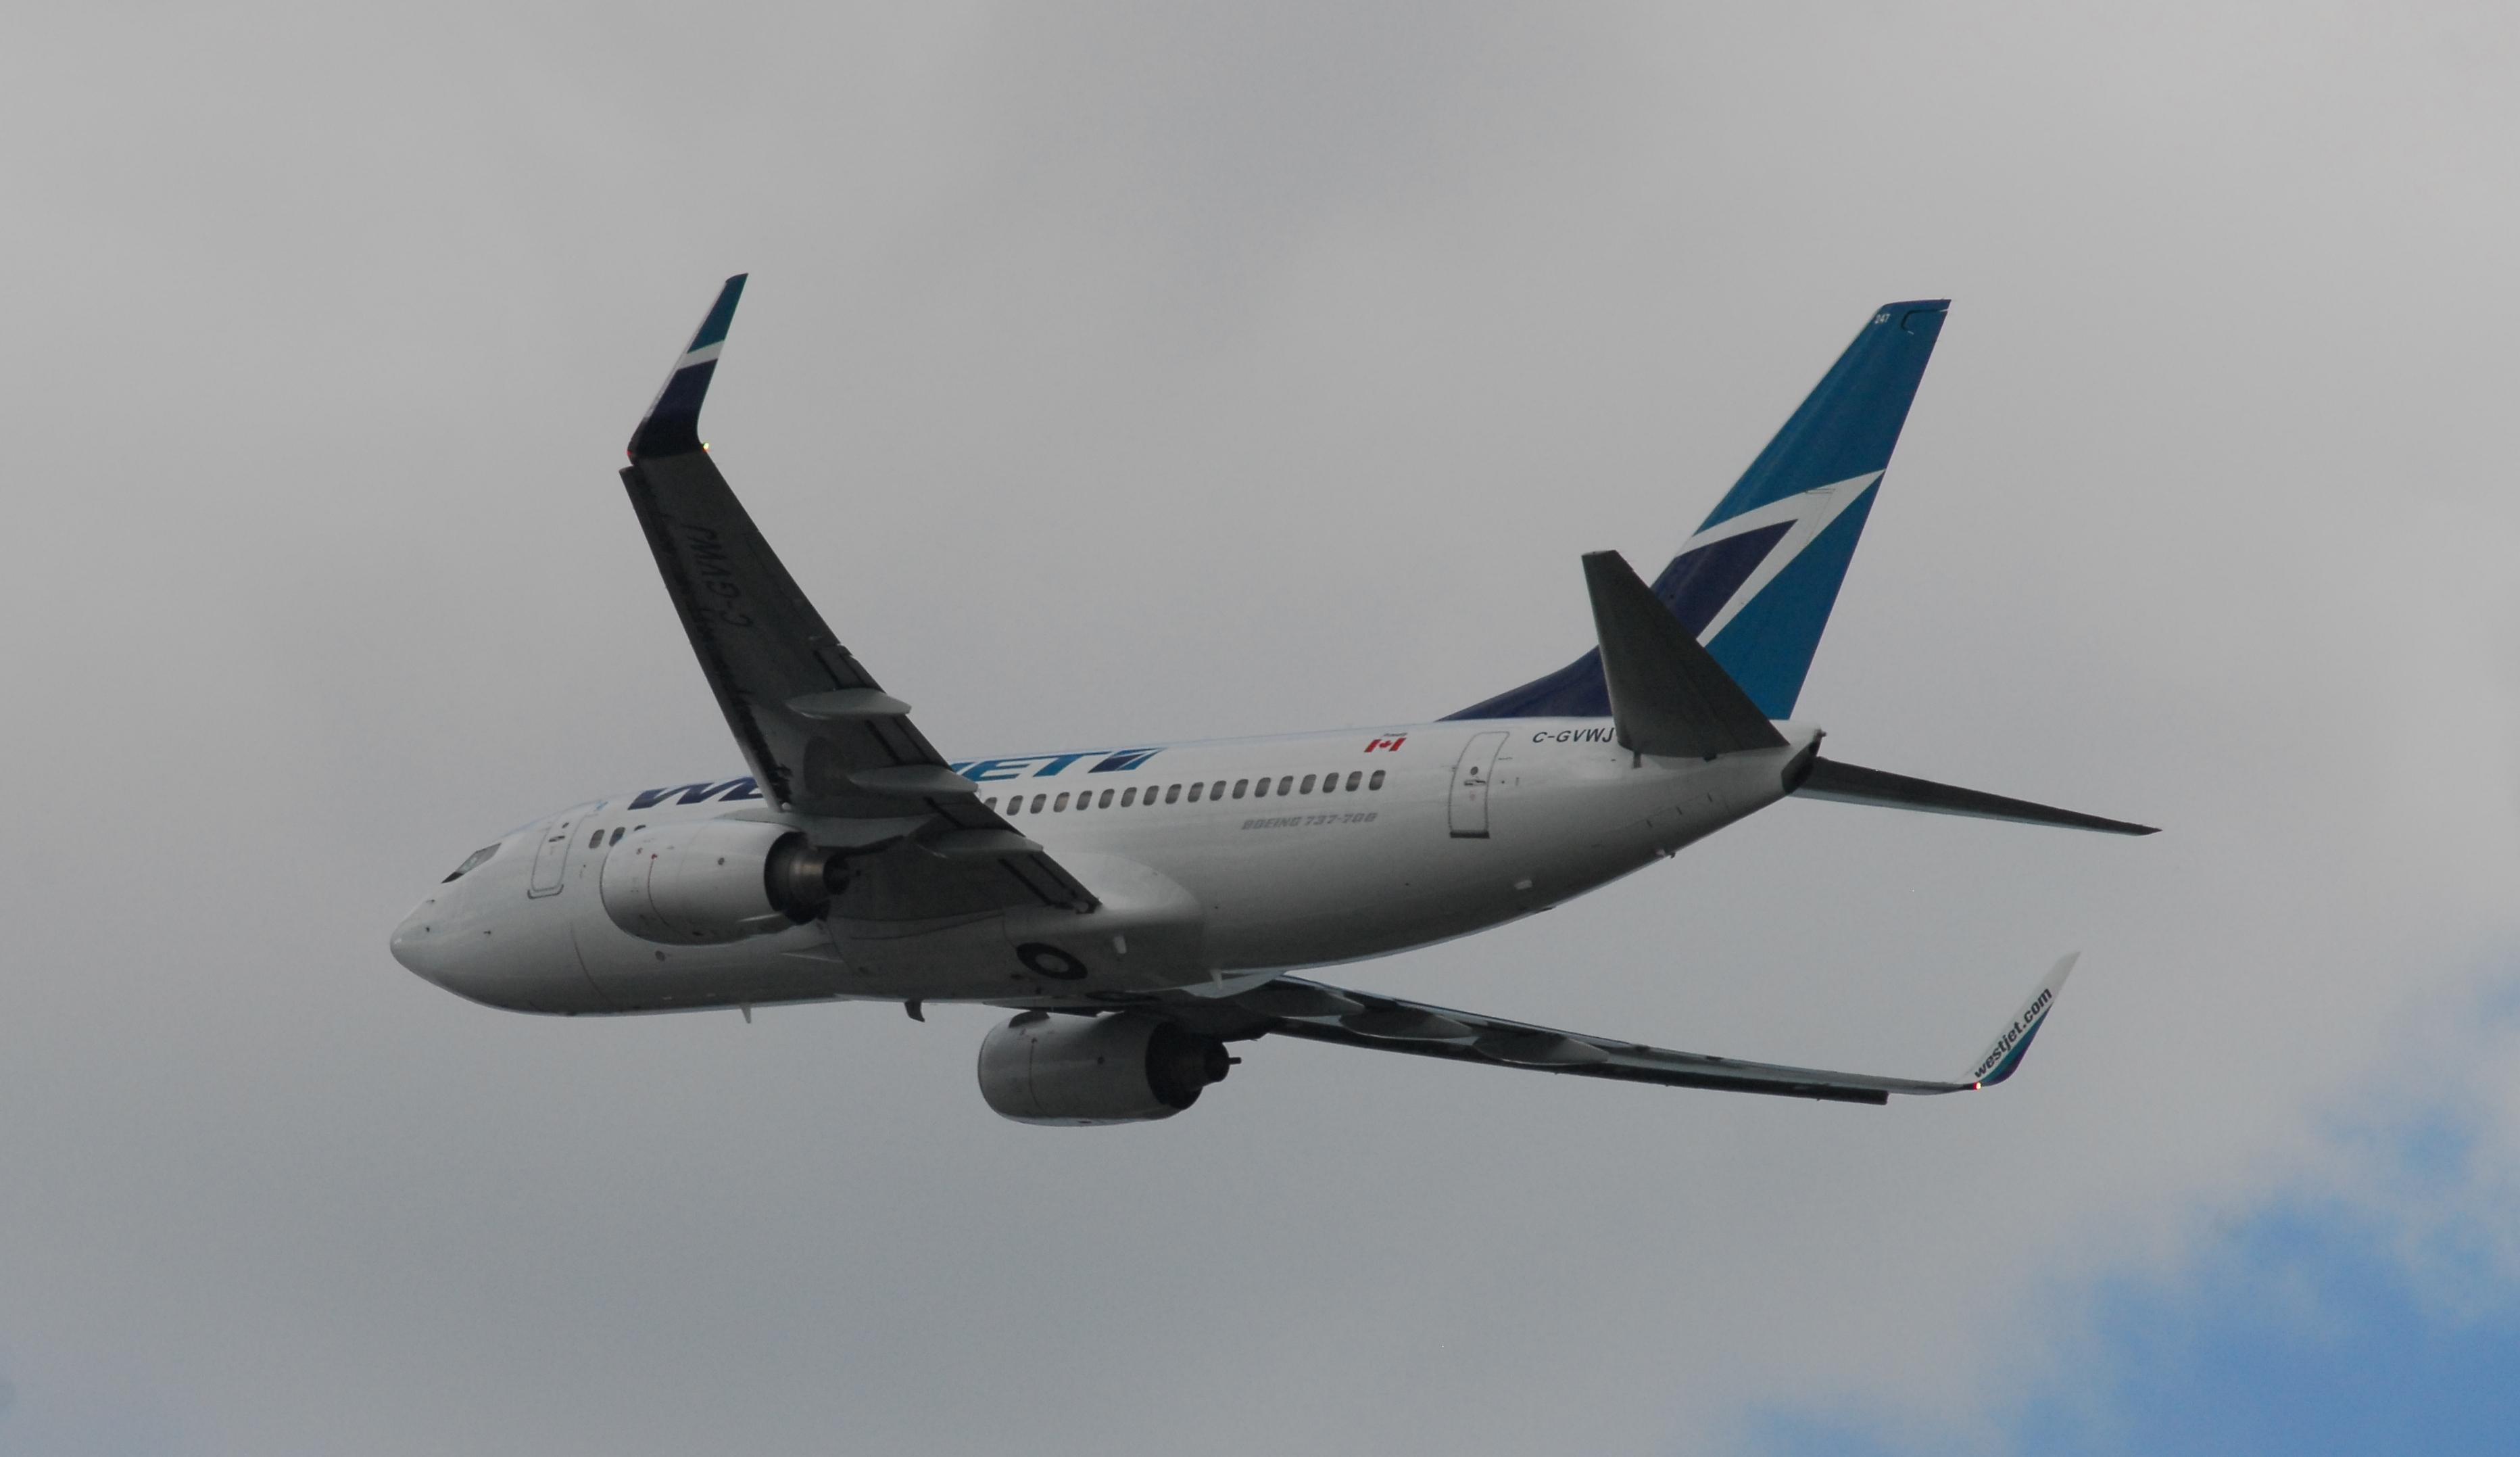 File:WestJet Boeing 737-7CT - C-GVWJ - Flight WS16 from